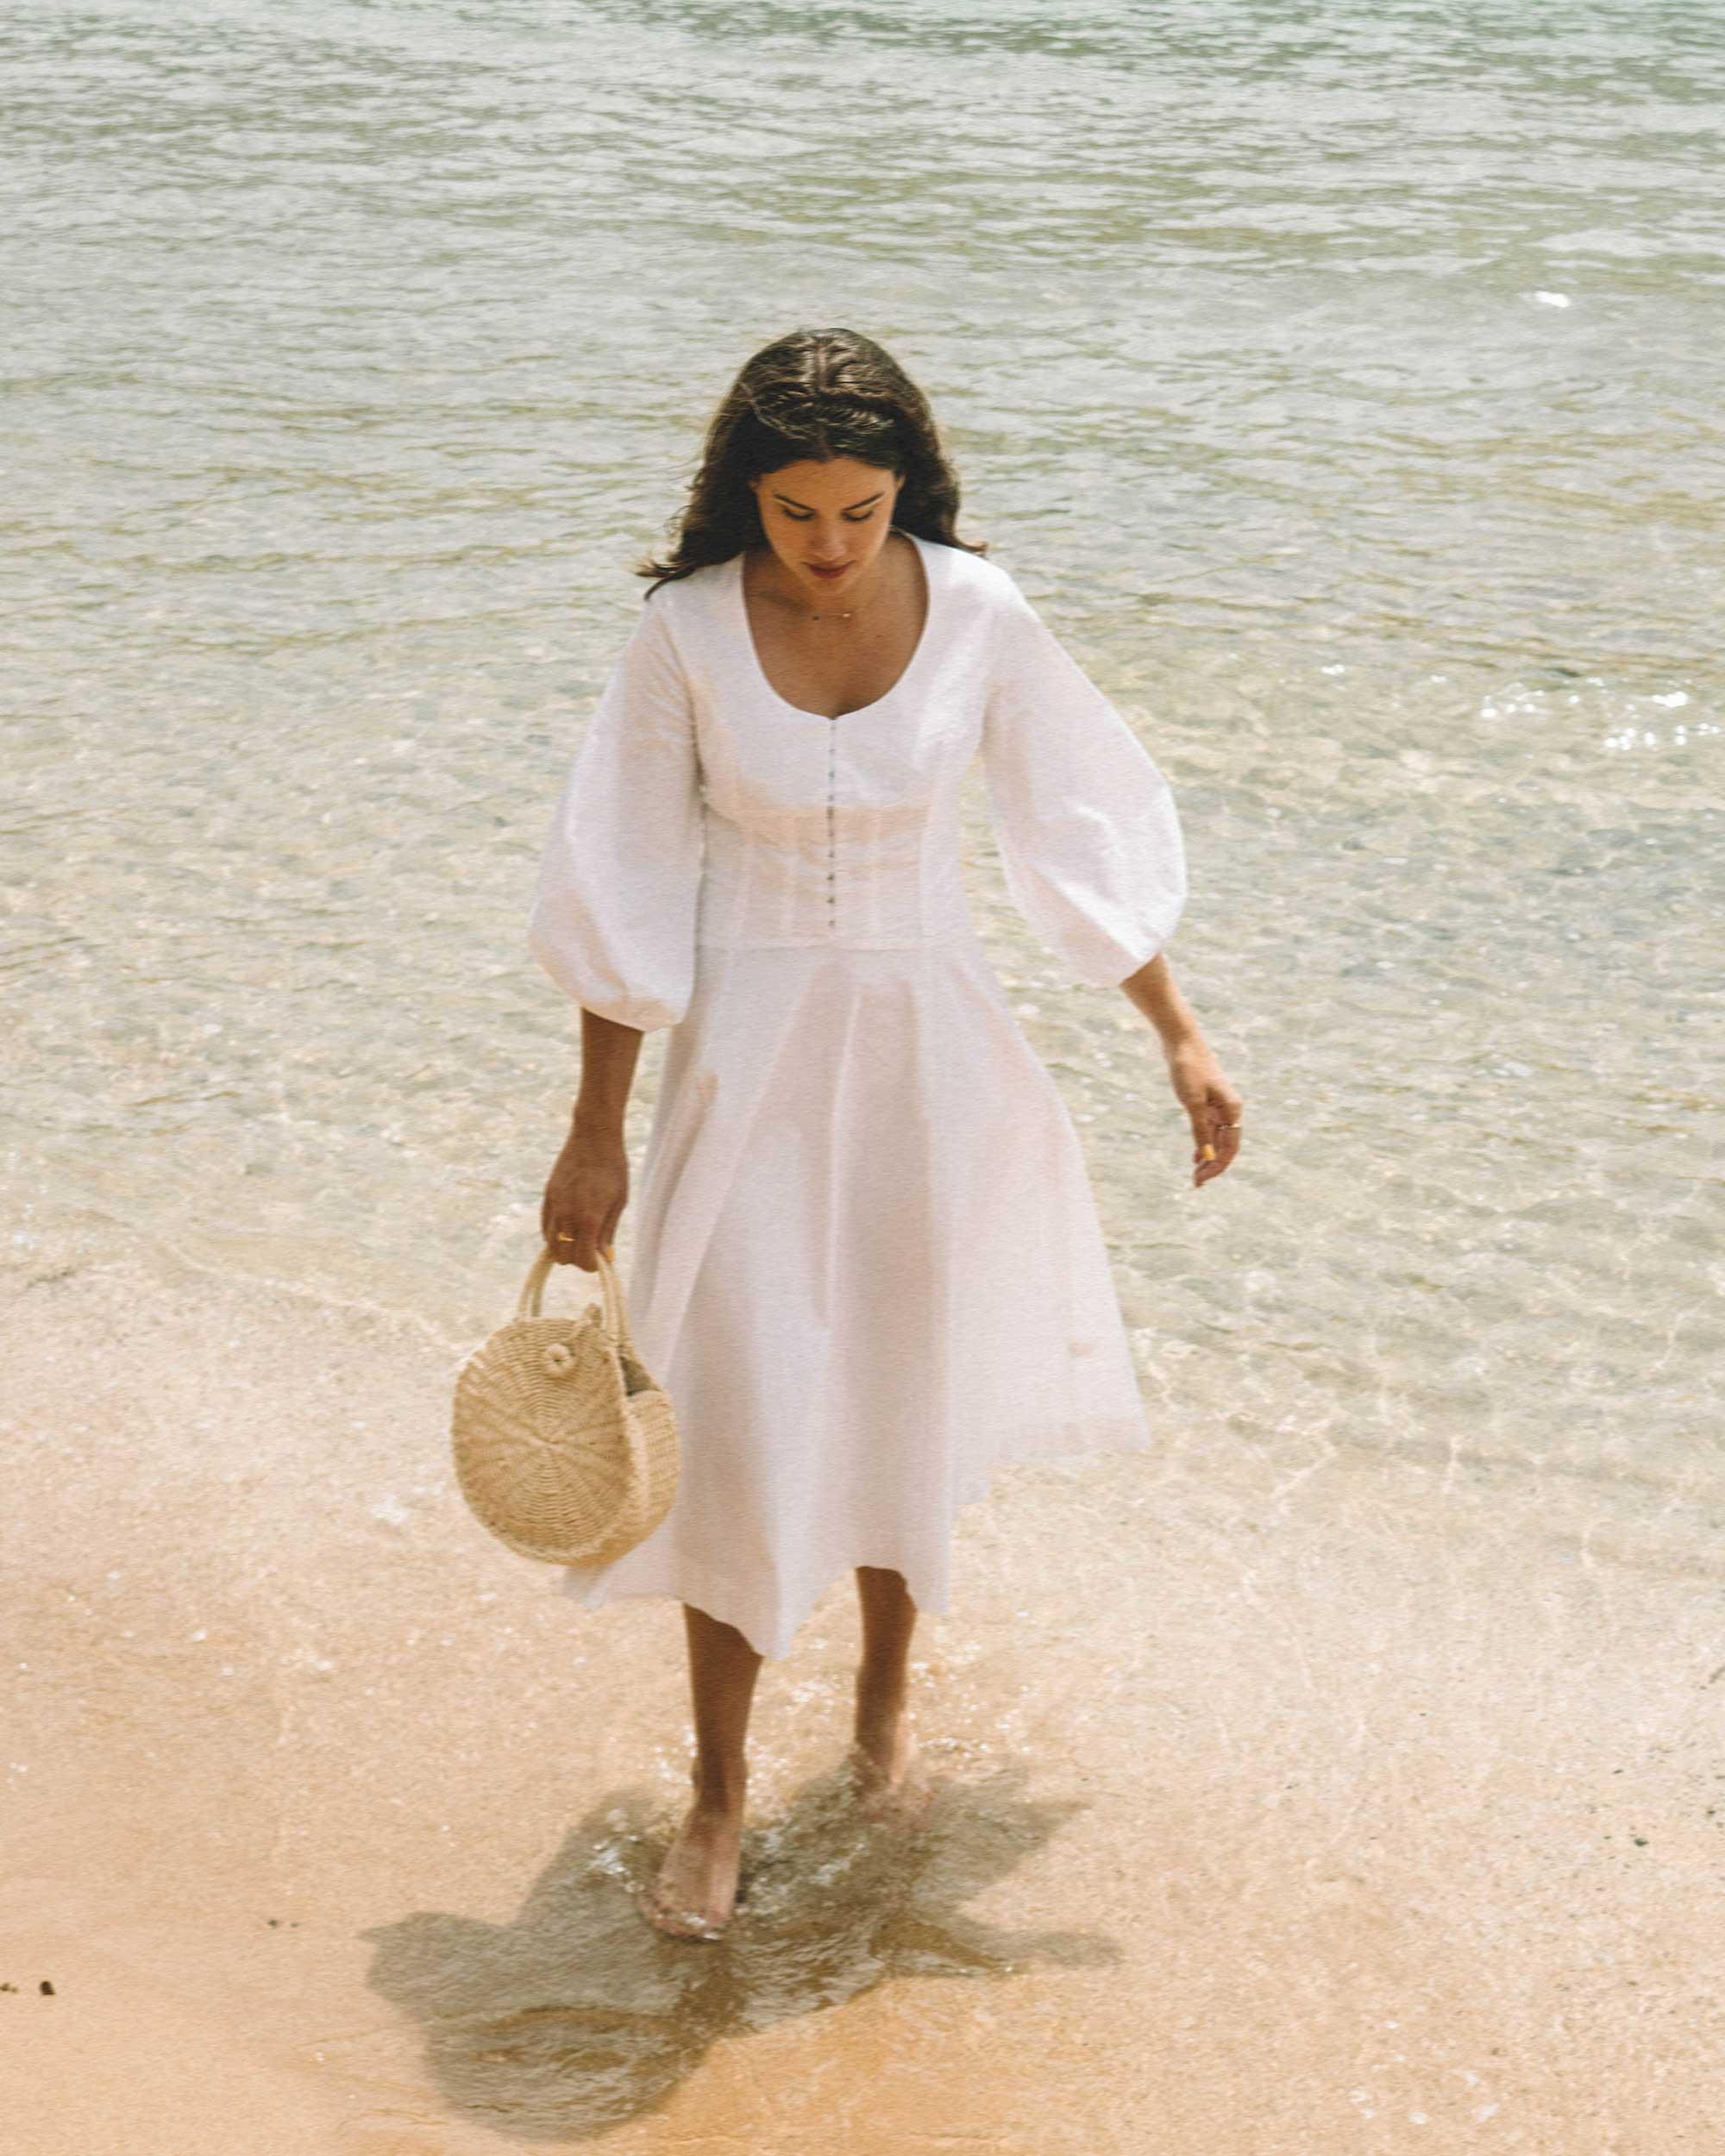 Staud in Greece - Seaside in Staud Birdie midi flare peasant dress in Athens, Greece